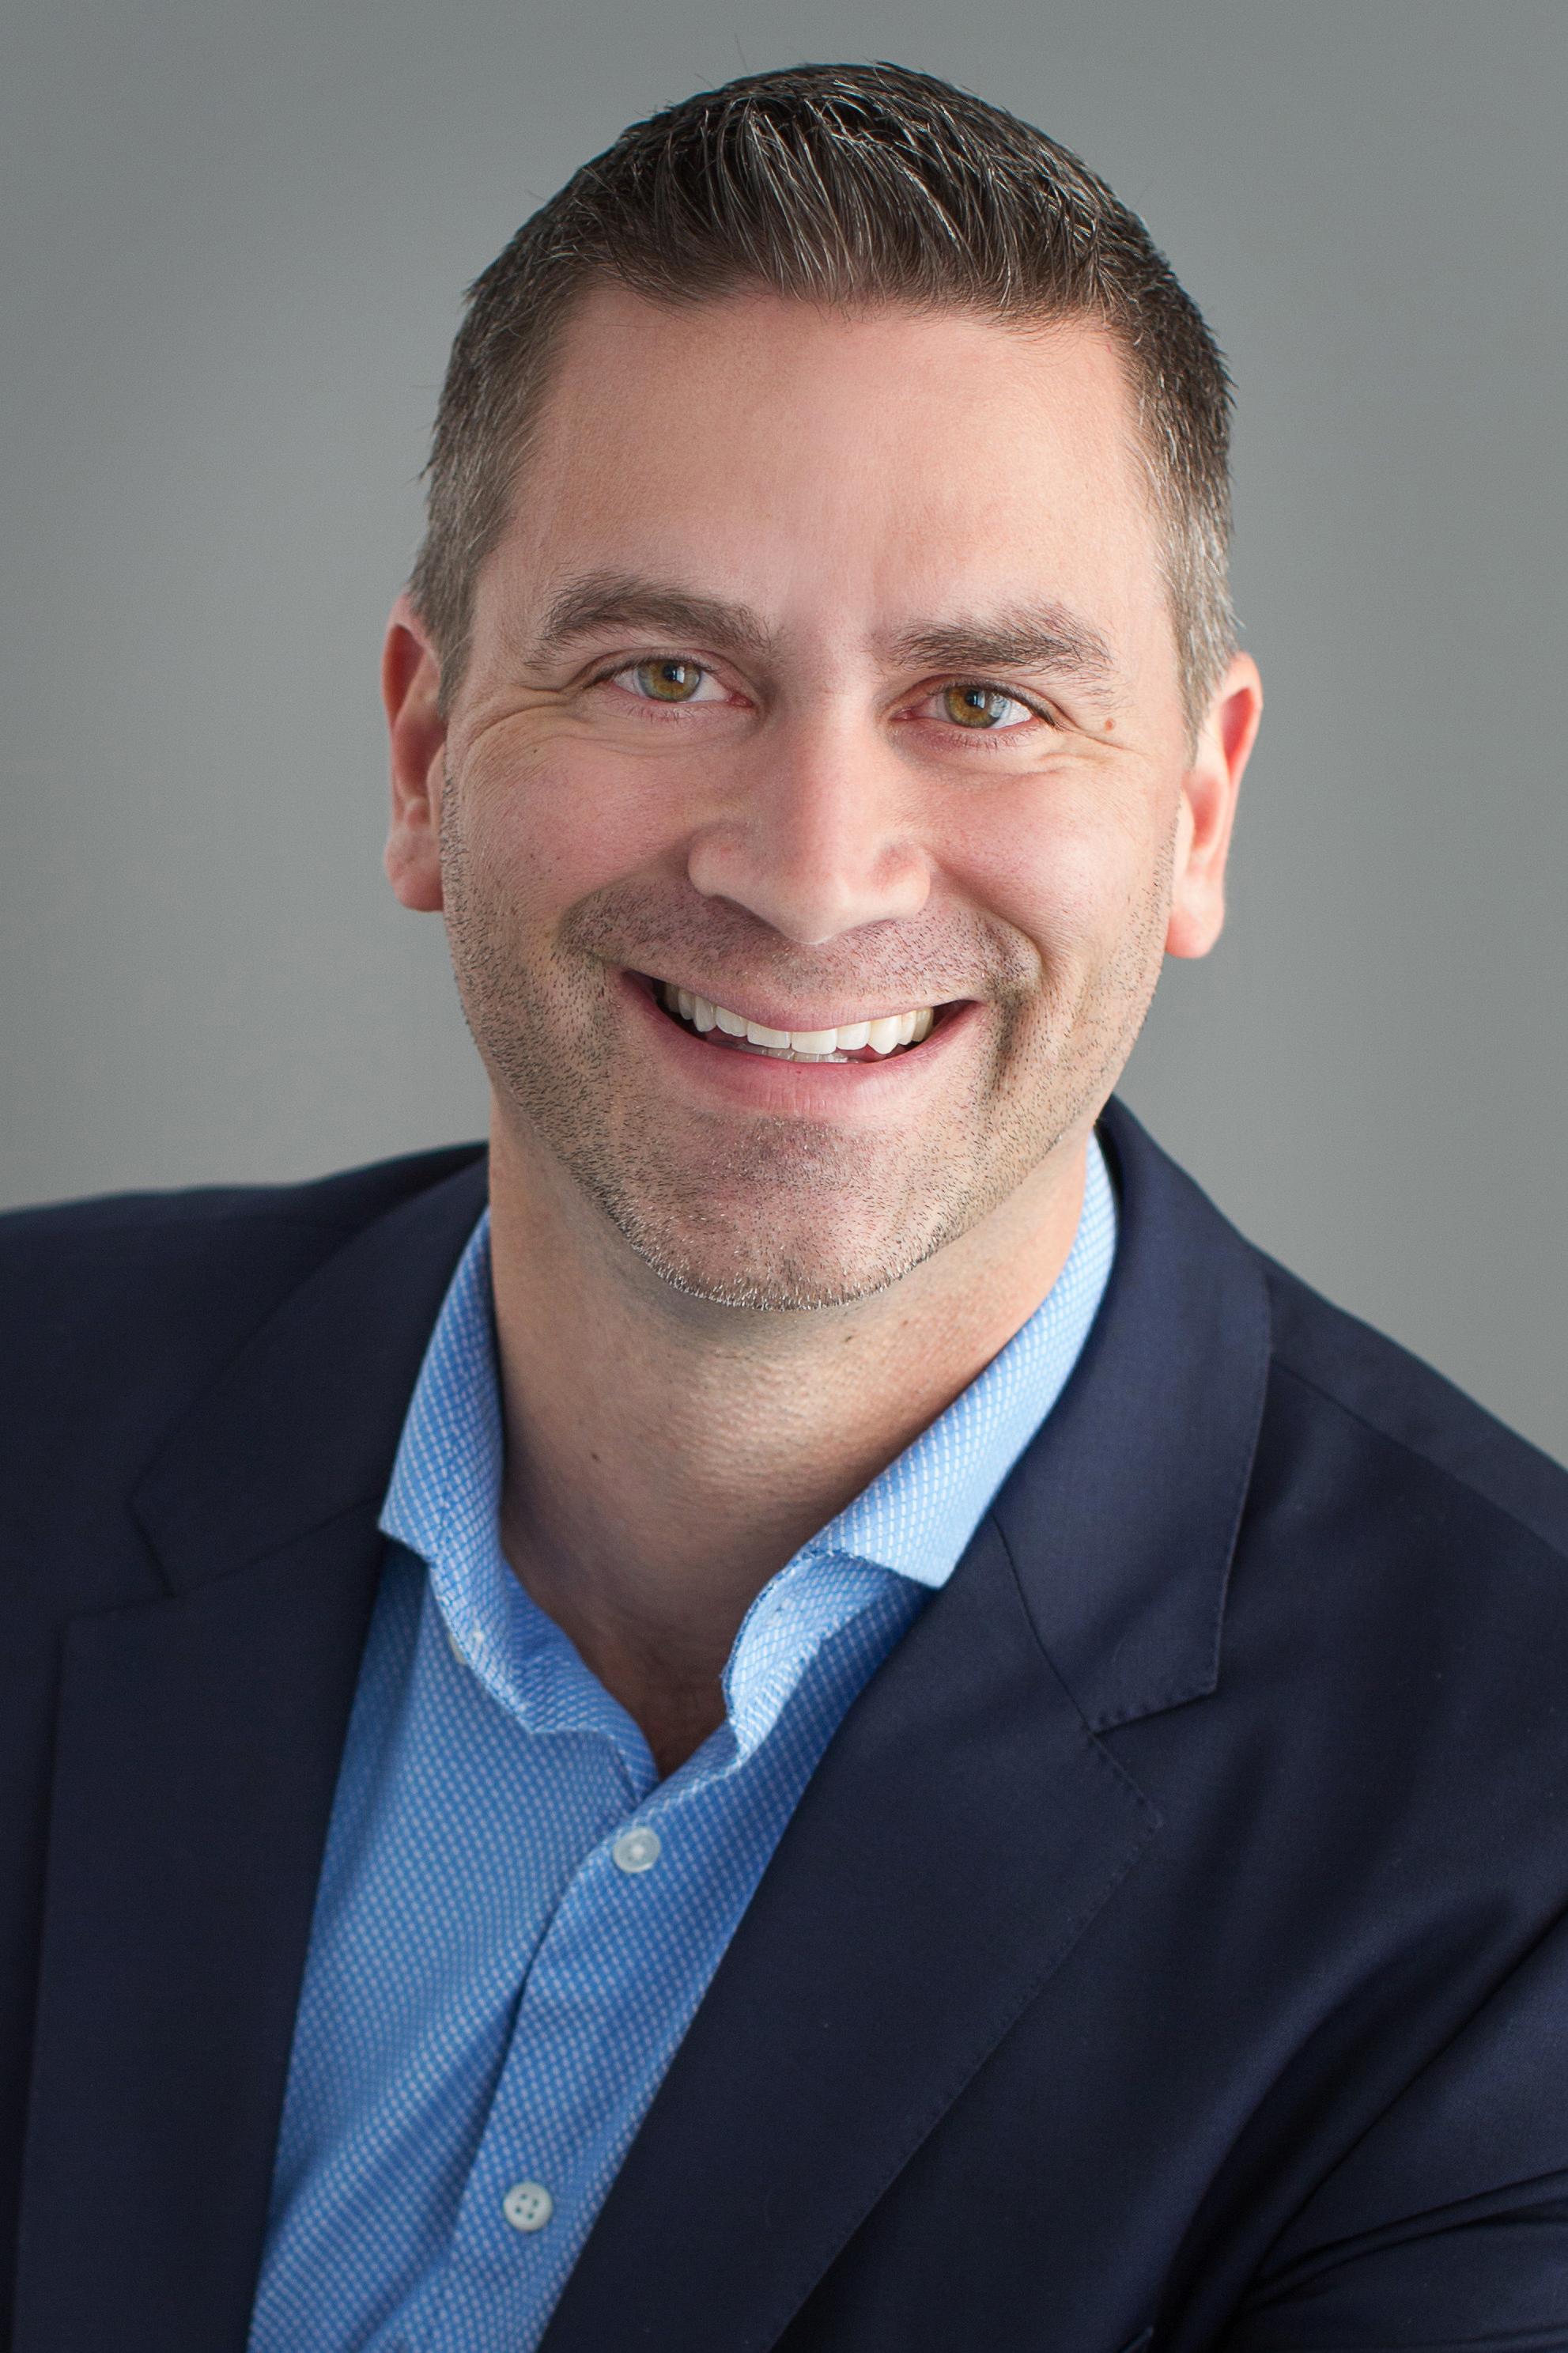 Michael Borsic